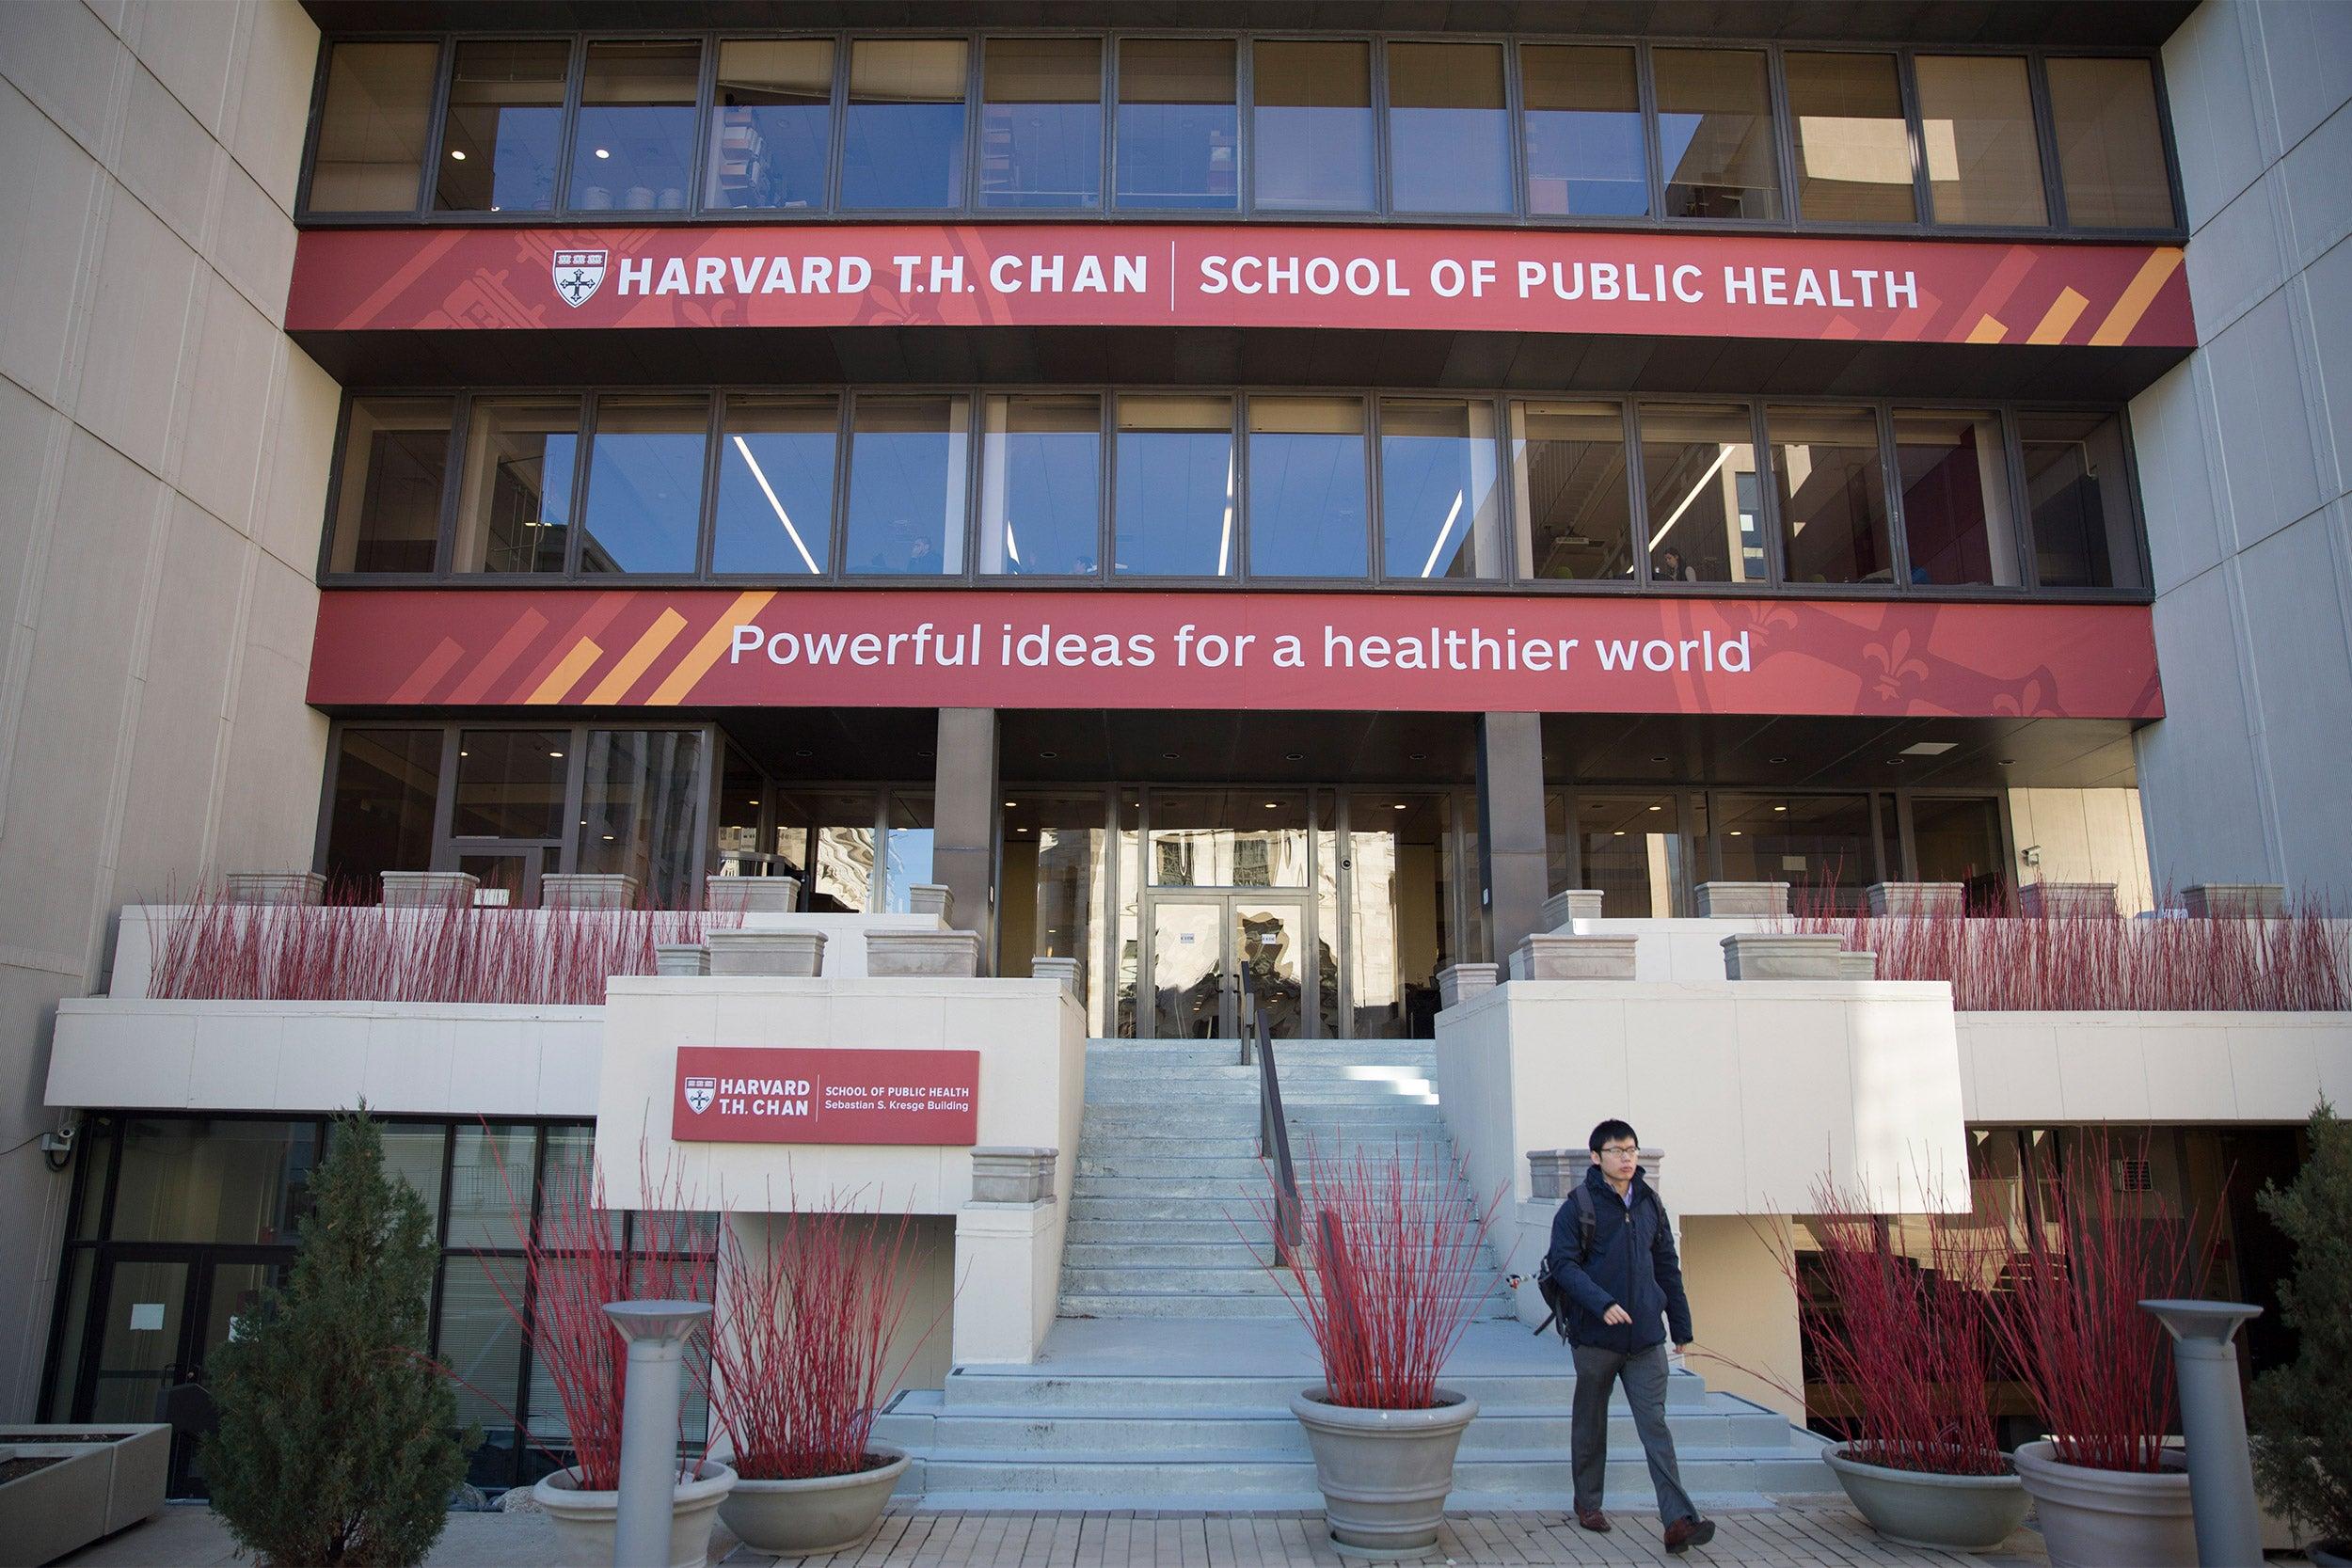 Harvard T.H. Chan School of Public Health.